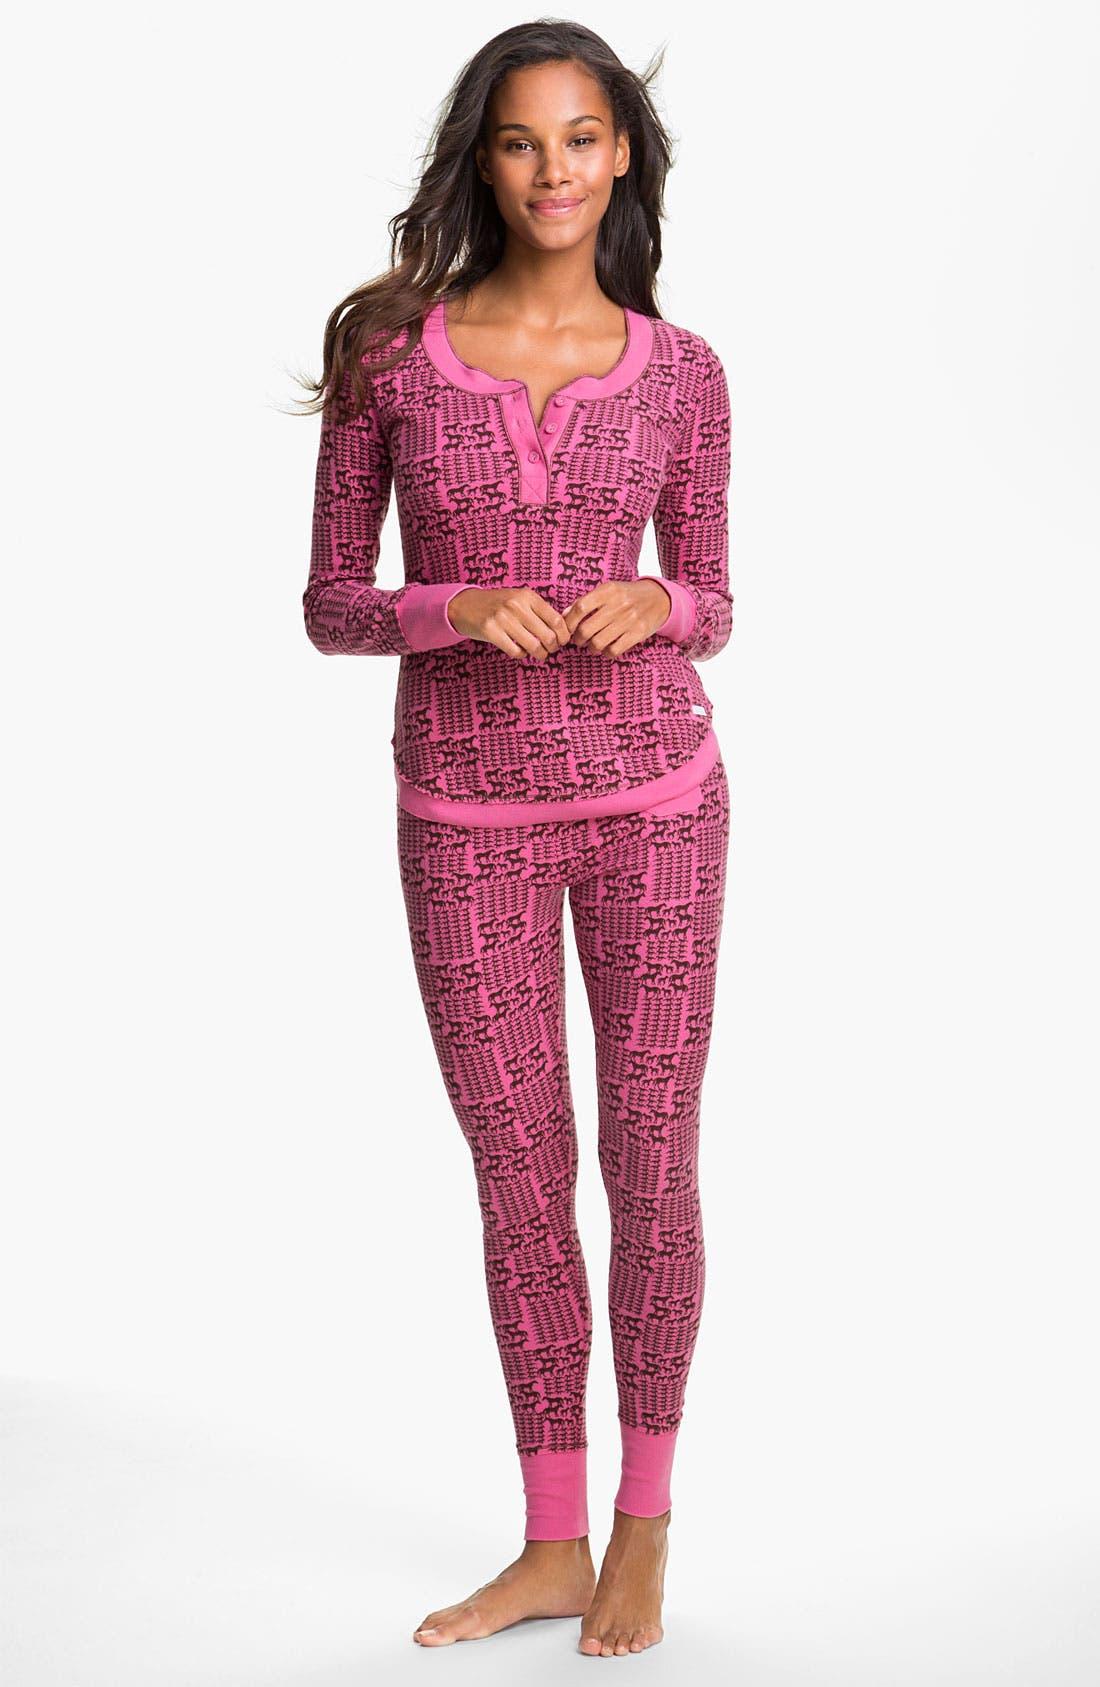 Main Image - Kensie 'Quite the Character' Thermal Pajamas